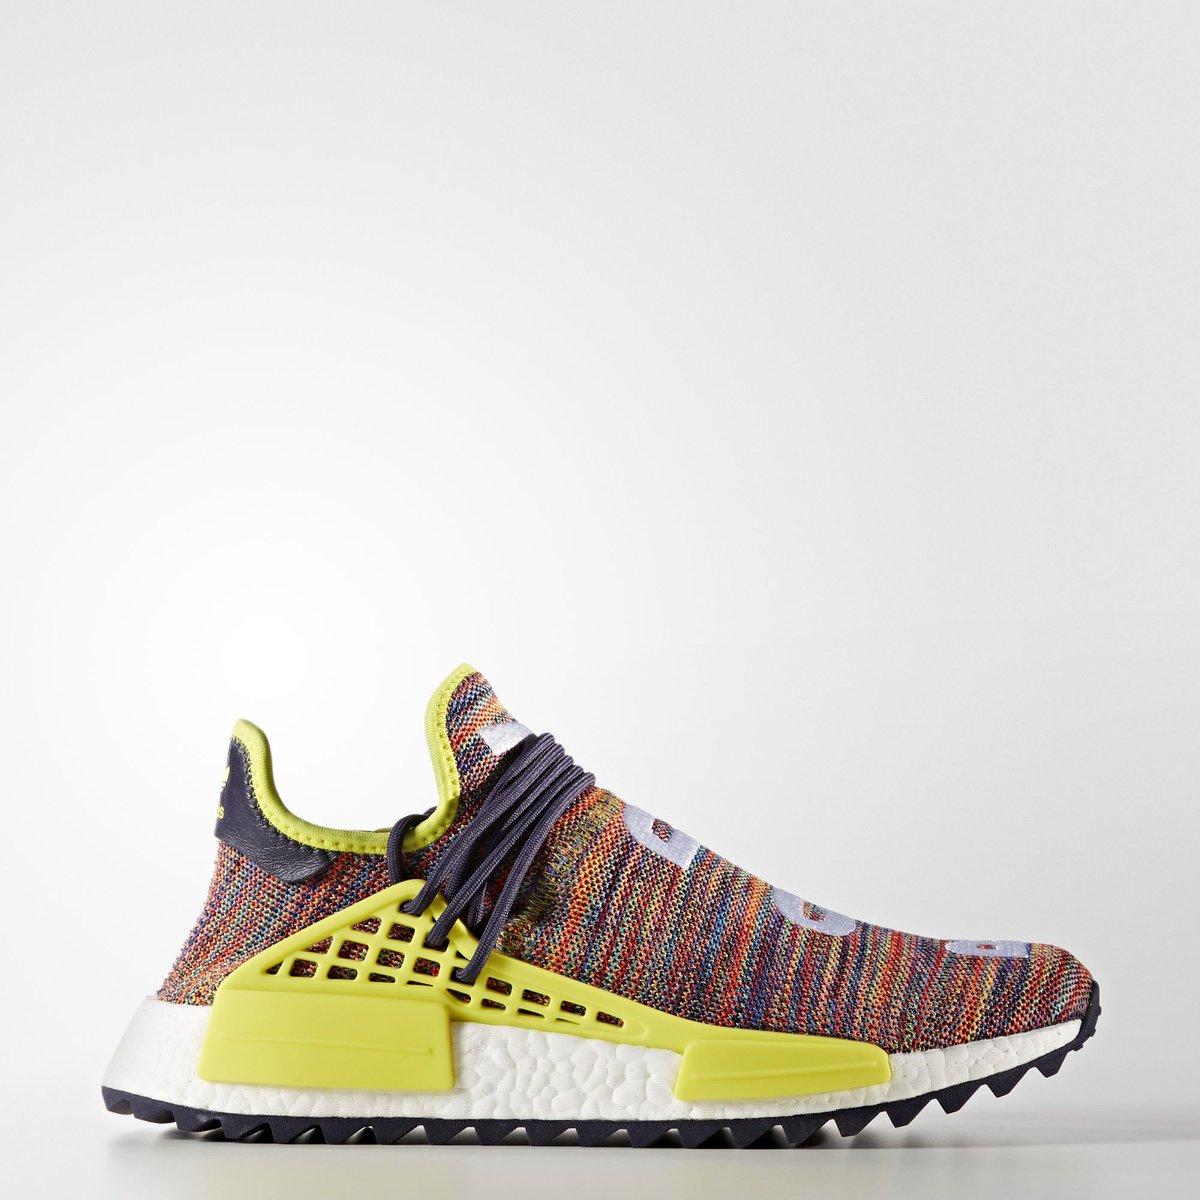 Billionare Boys Club x adidas NMD Human Race TR Cotton Candy colorway 36e0e2ac8